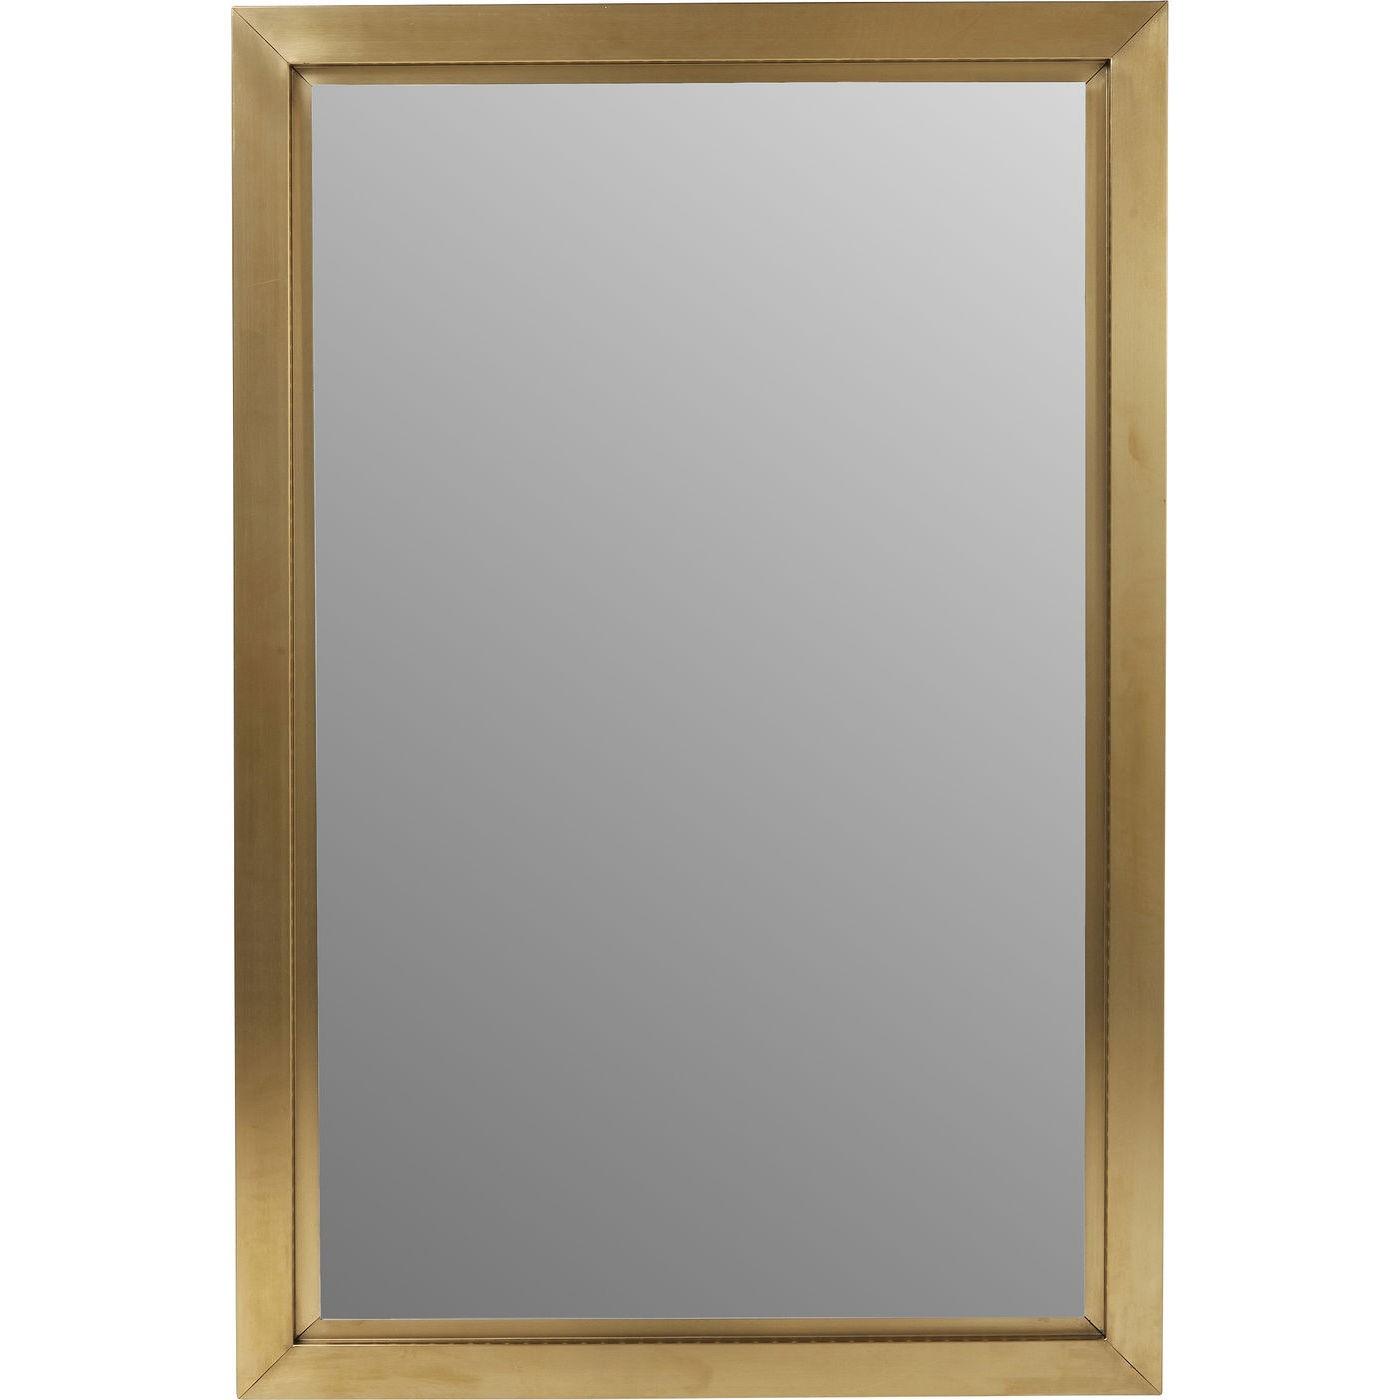 Miroir Flash LED rectangulaire 120x80cm Kare Design